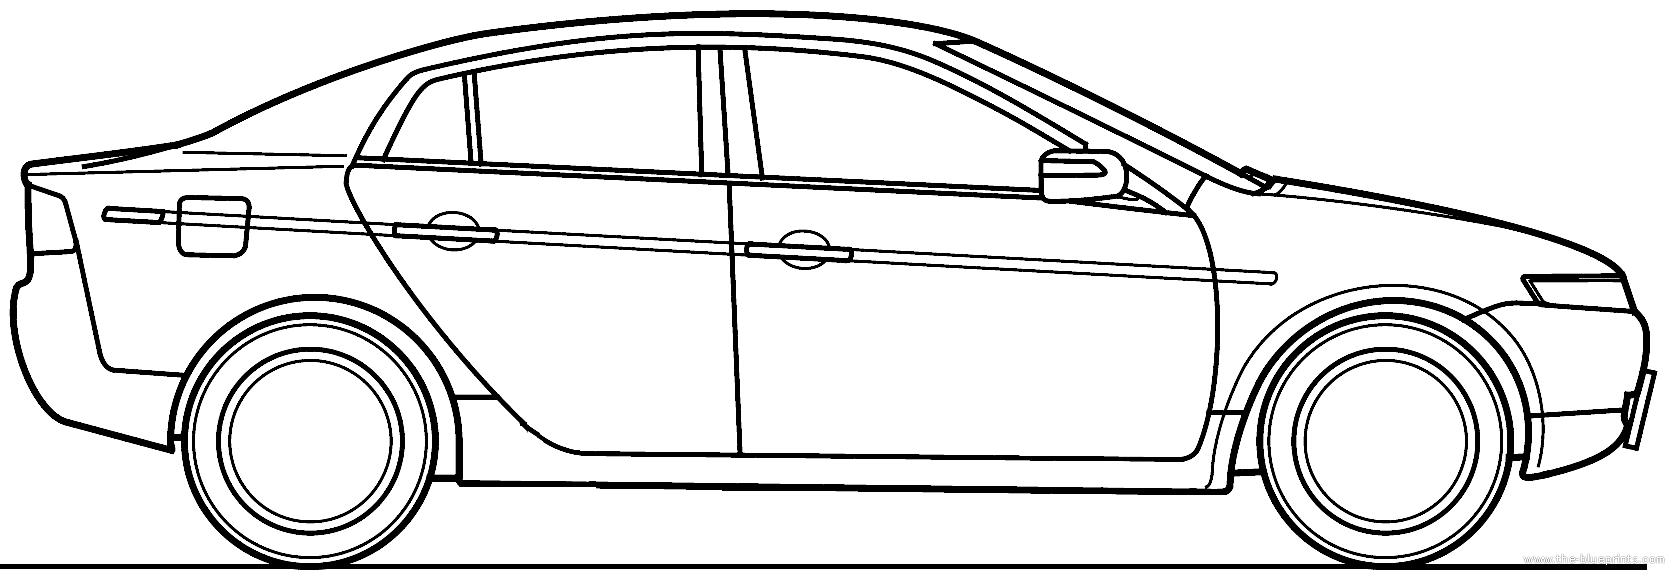 The blueprints blueprints cars acura acura tl 2008 acura tl 2008 malvernweather Choice Image